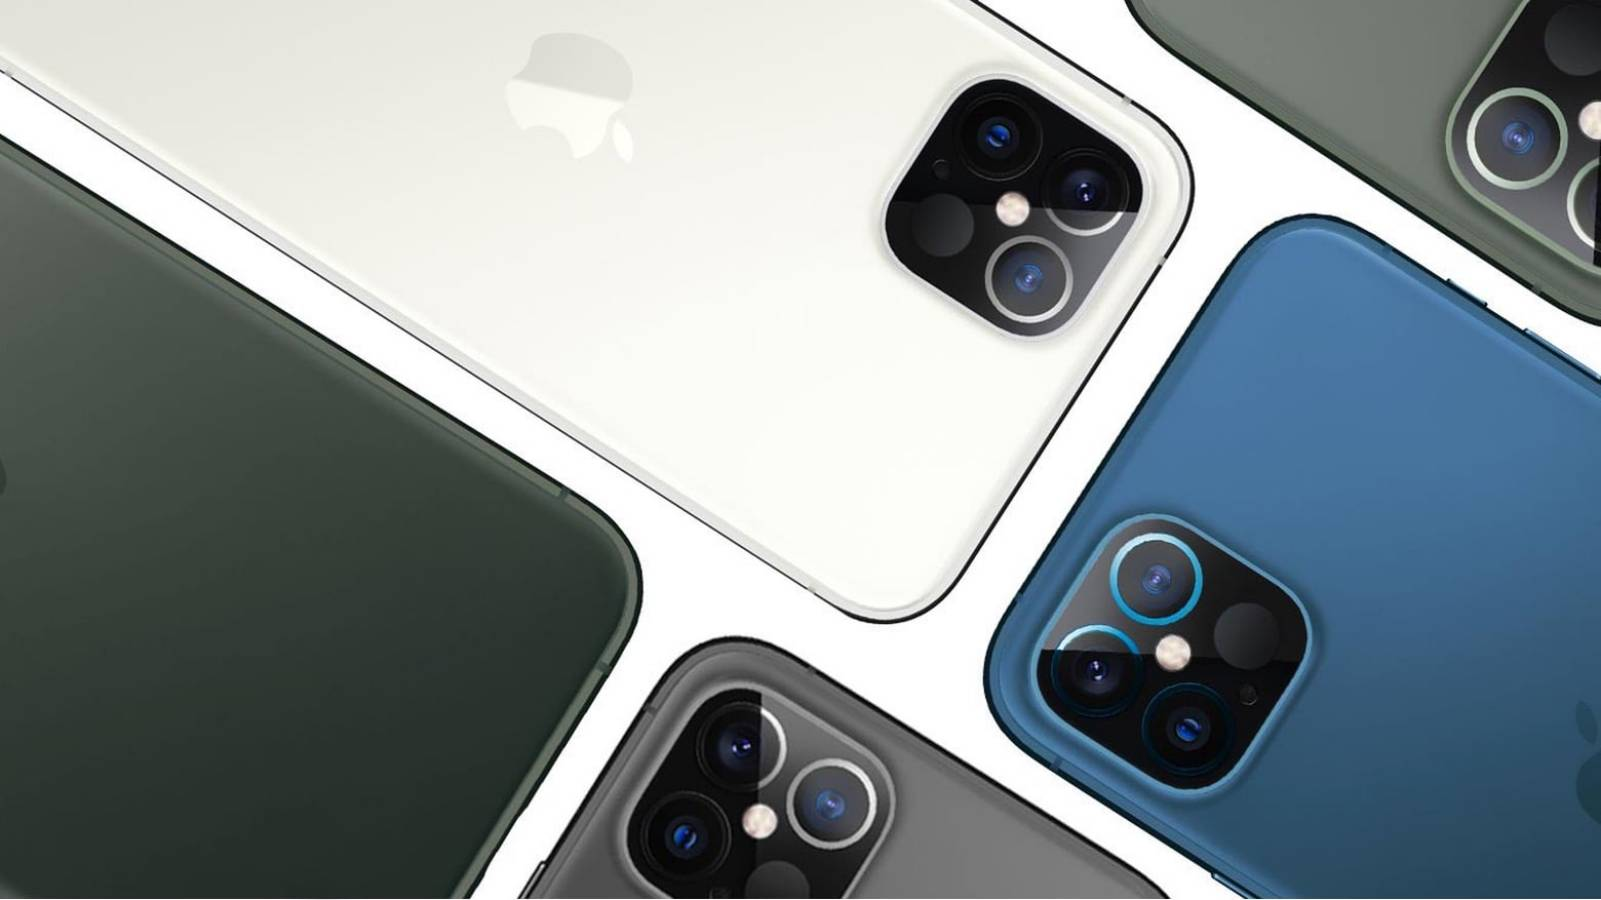 iPhone 12 ecran touch id